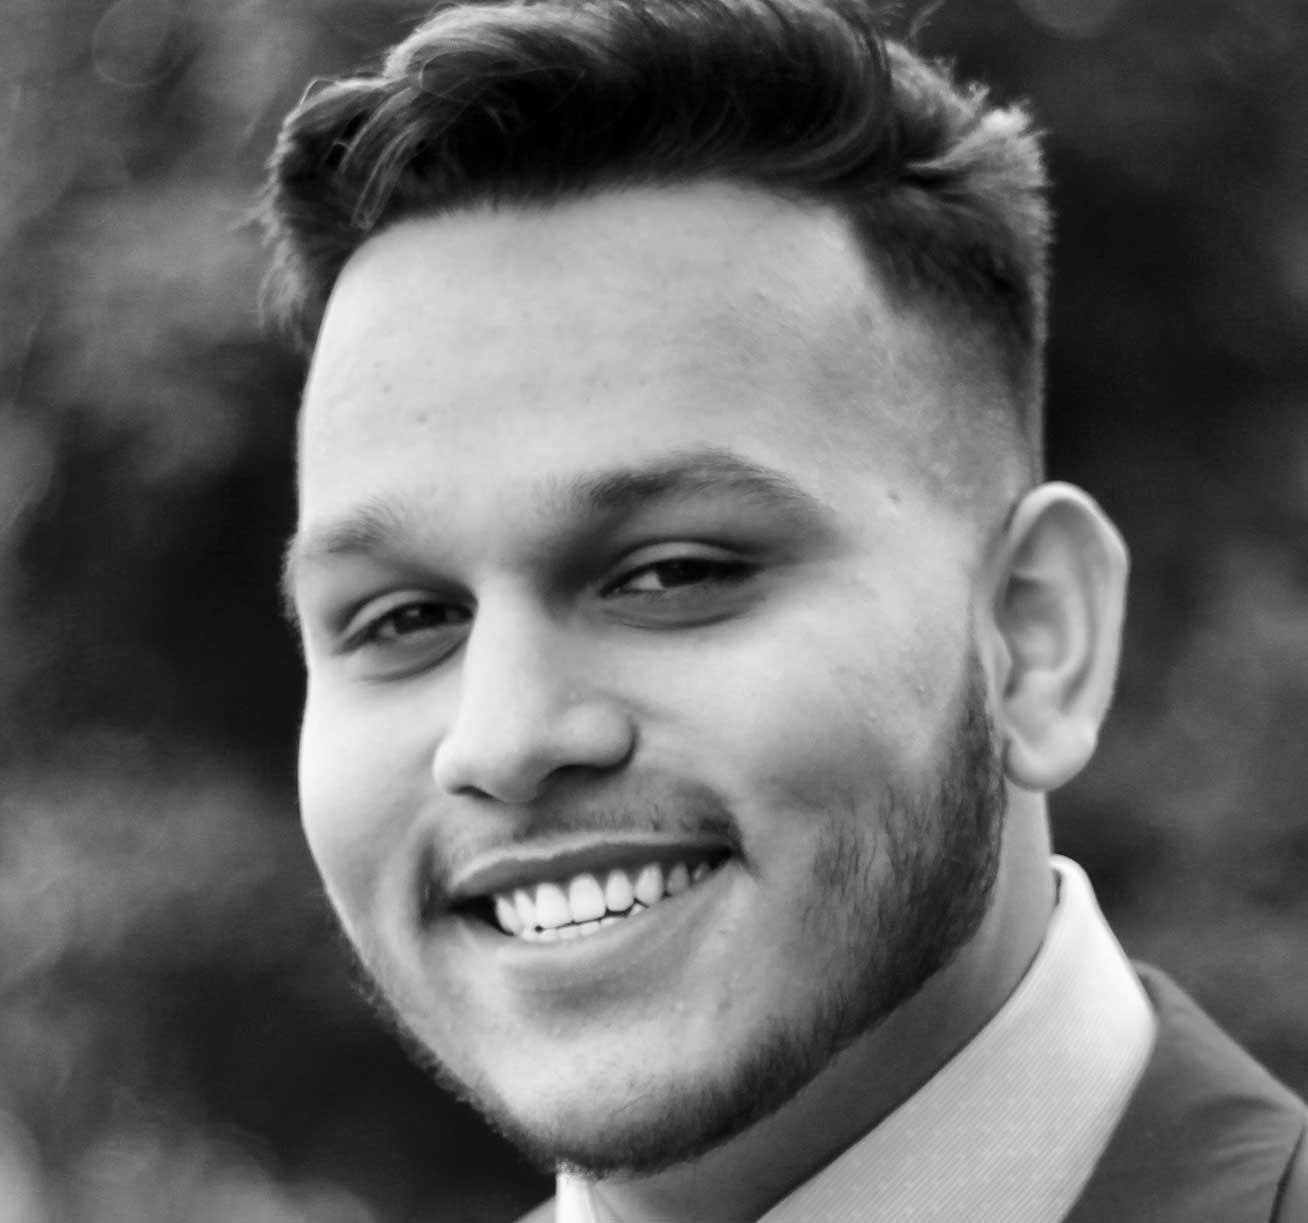 A black and white cropped headshot of Shubhdeep Nagi